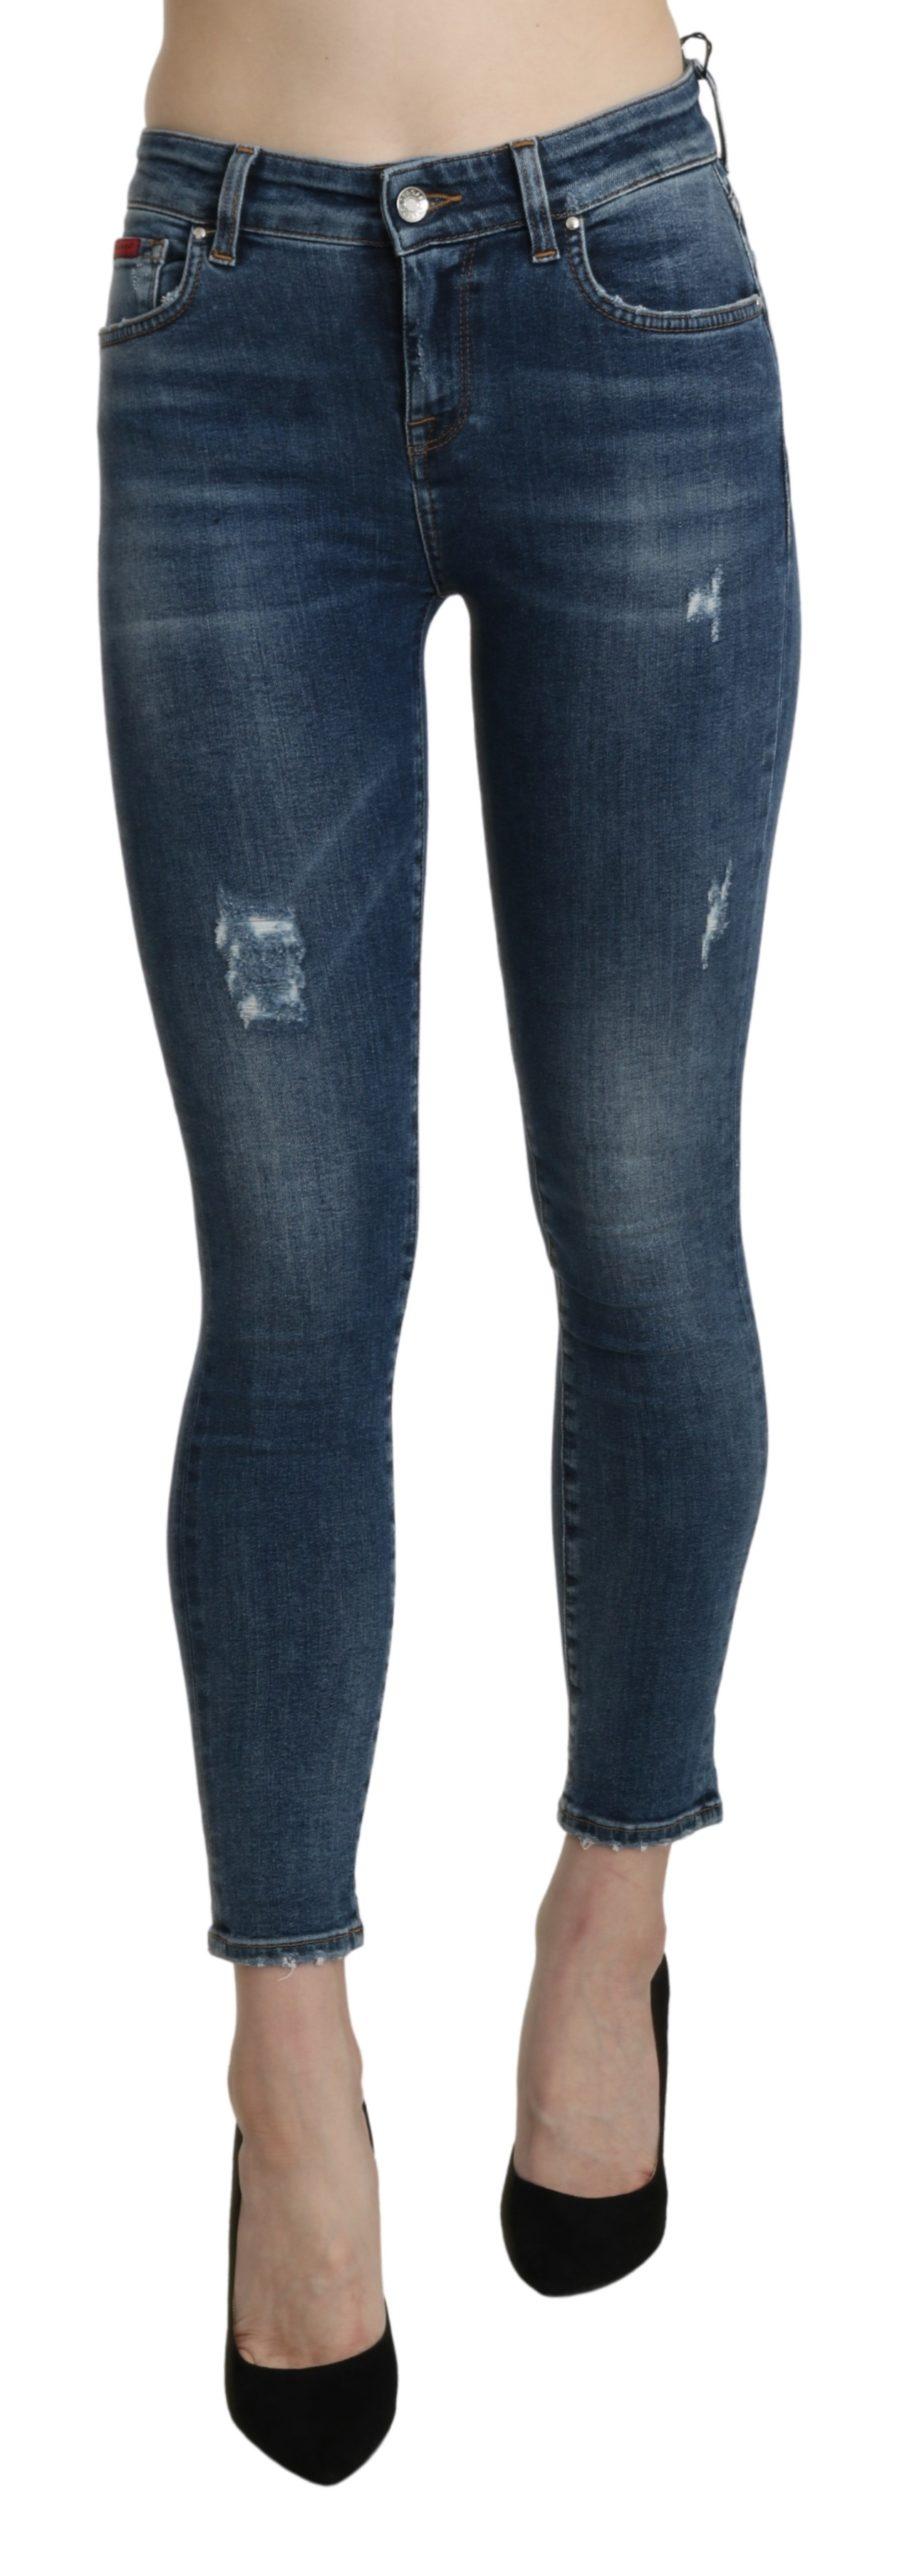 Blue Skinny Trouser Cotton Stretch Jeans - IT36|XXS